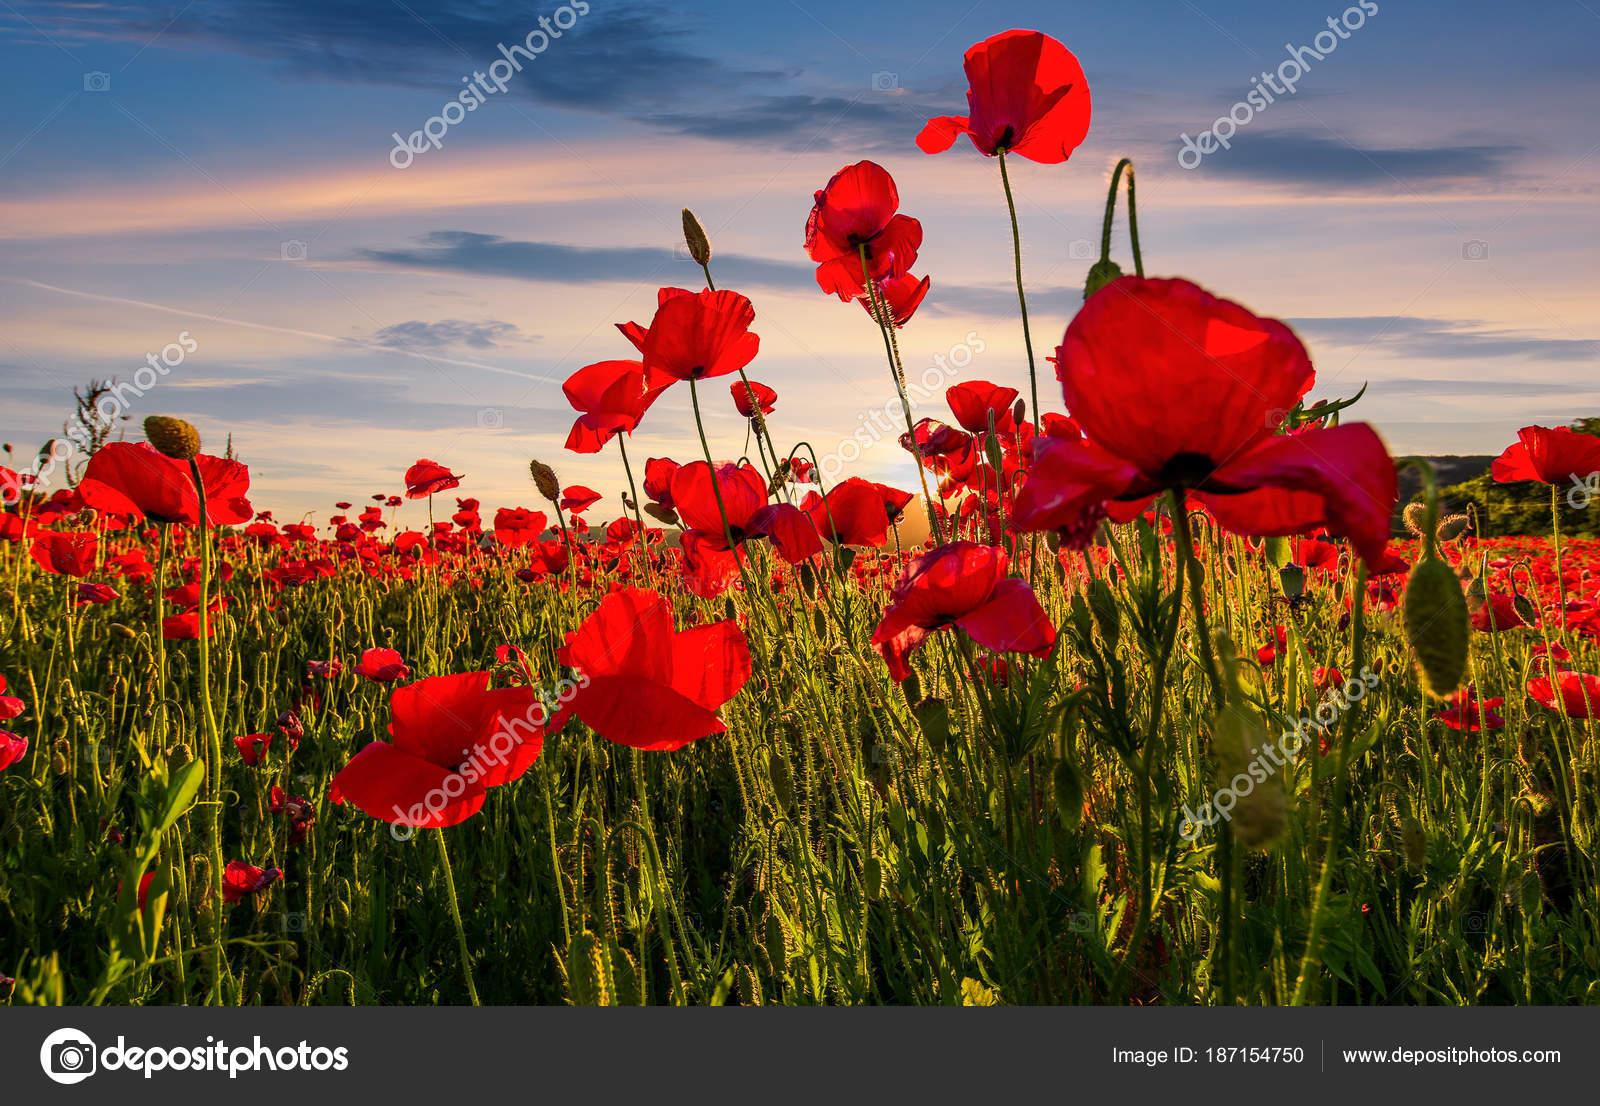 Poppy Flowers Field In Mountains Stock Photo Pellinni 187154750